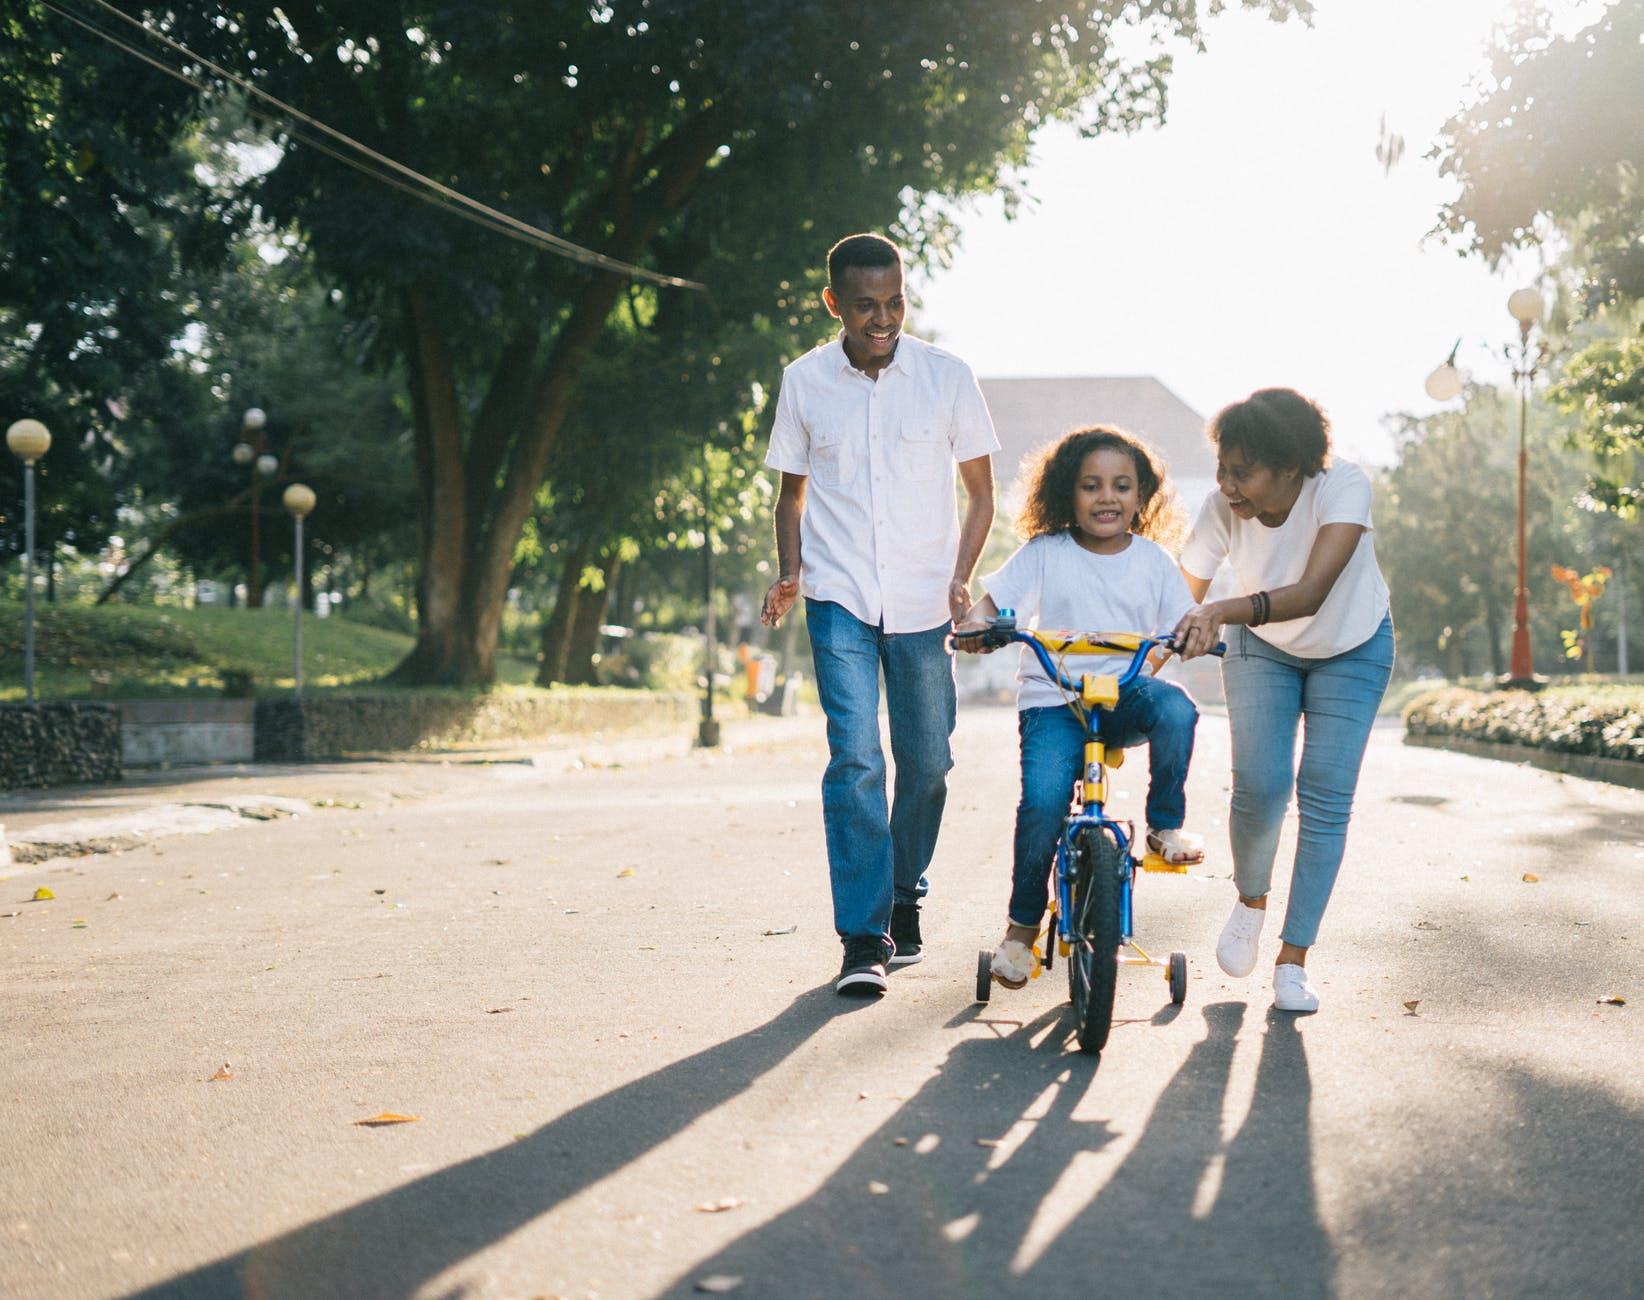 Parents run alongside their child riding a bike.